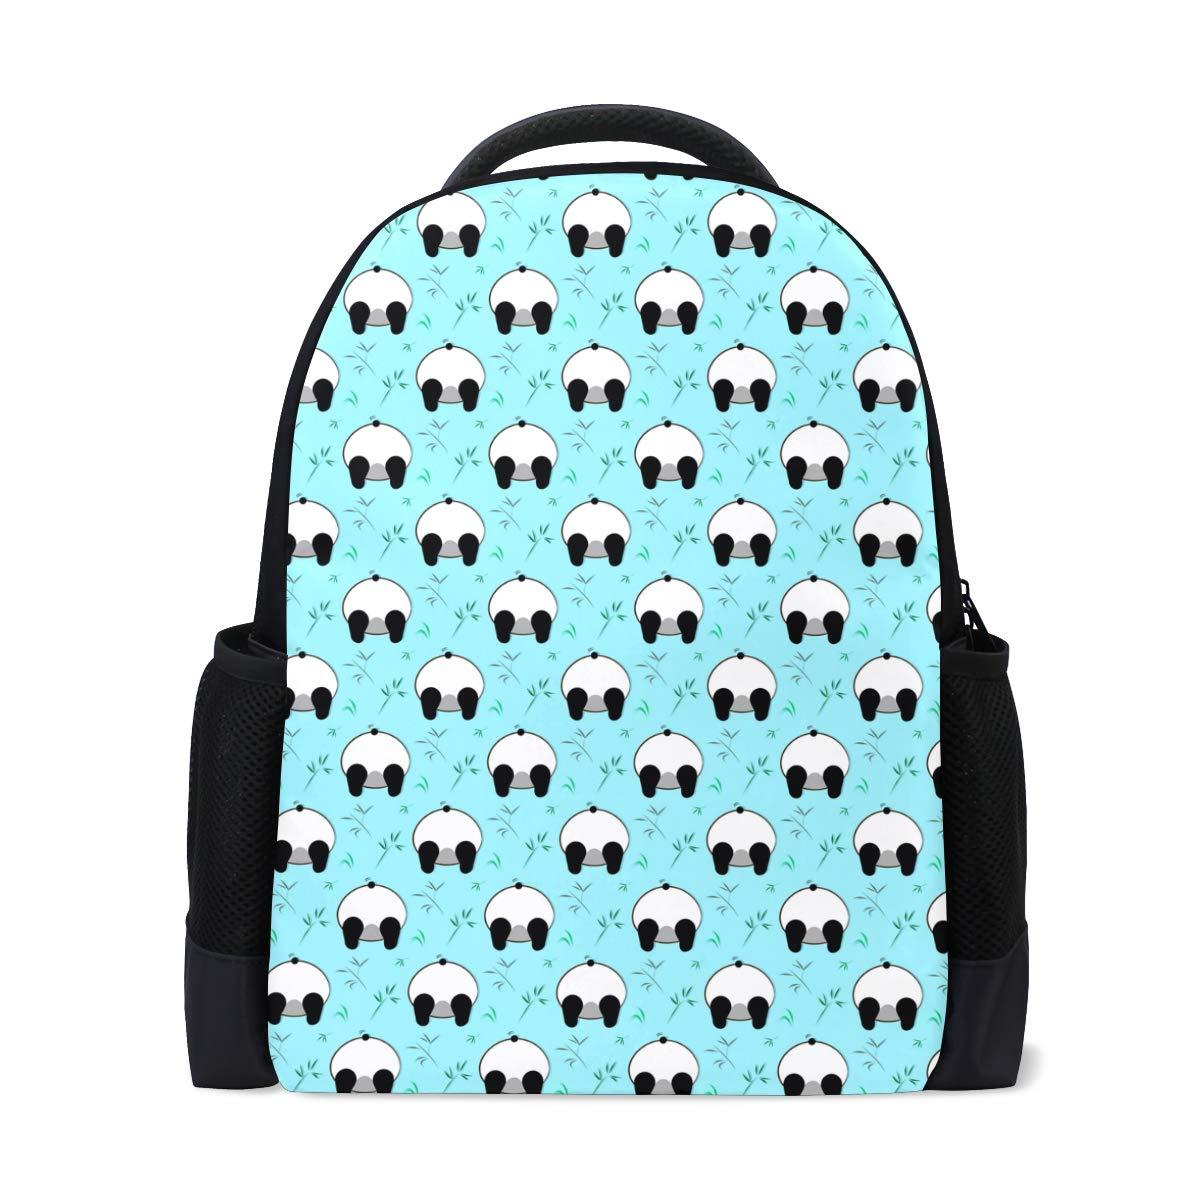 Funny Panda White BlackBear blueee Backpack Bookbags Waterproof Travel Daypack Bag Rucksack